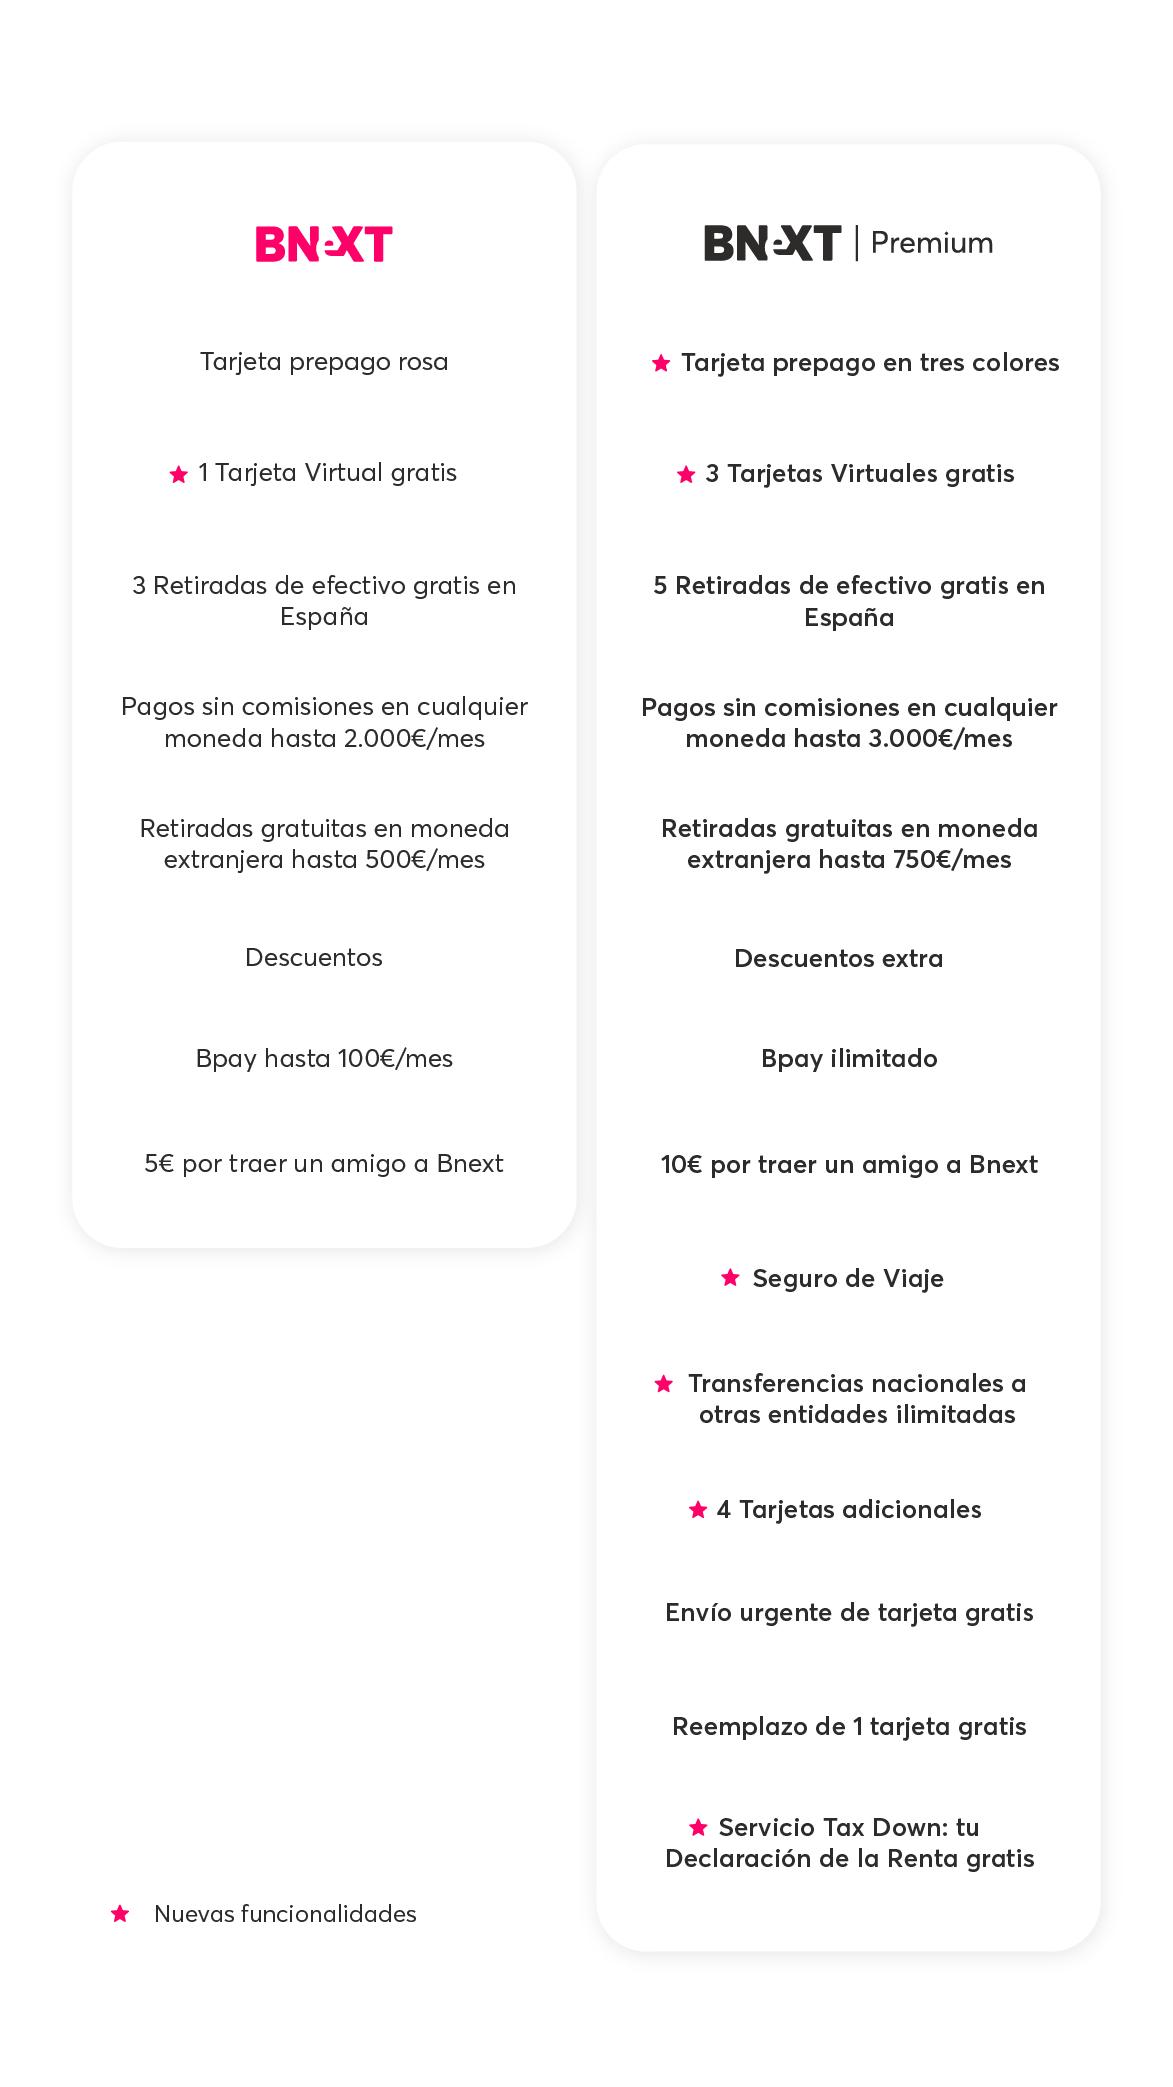 Comparativa Bnext estándar vs Bnext Premium